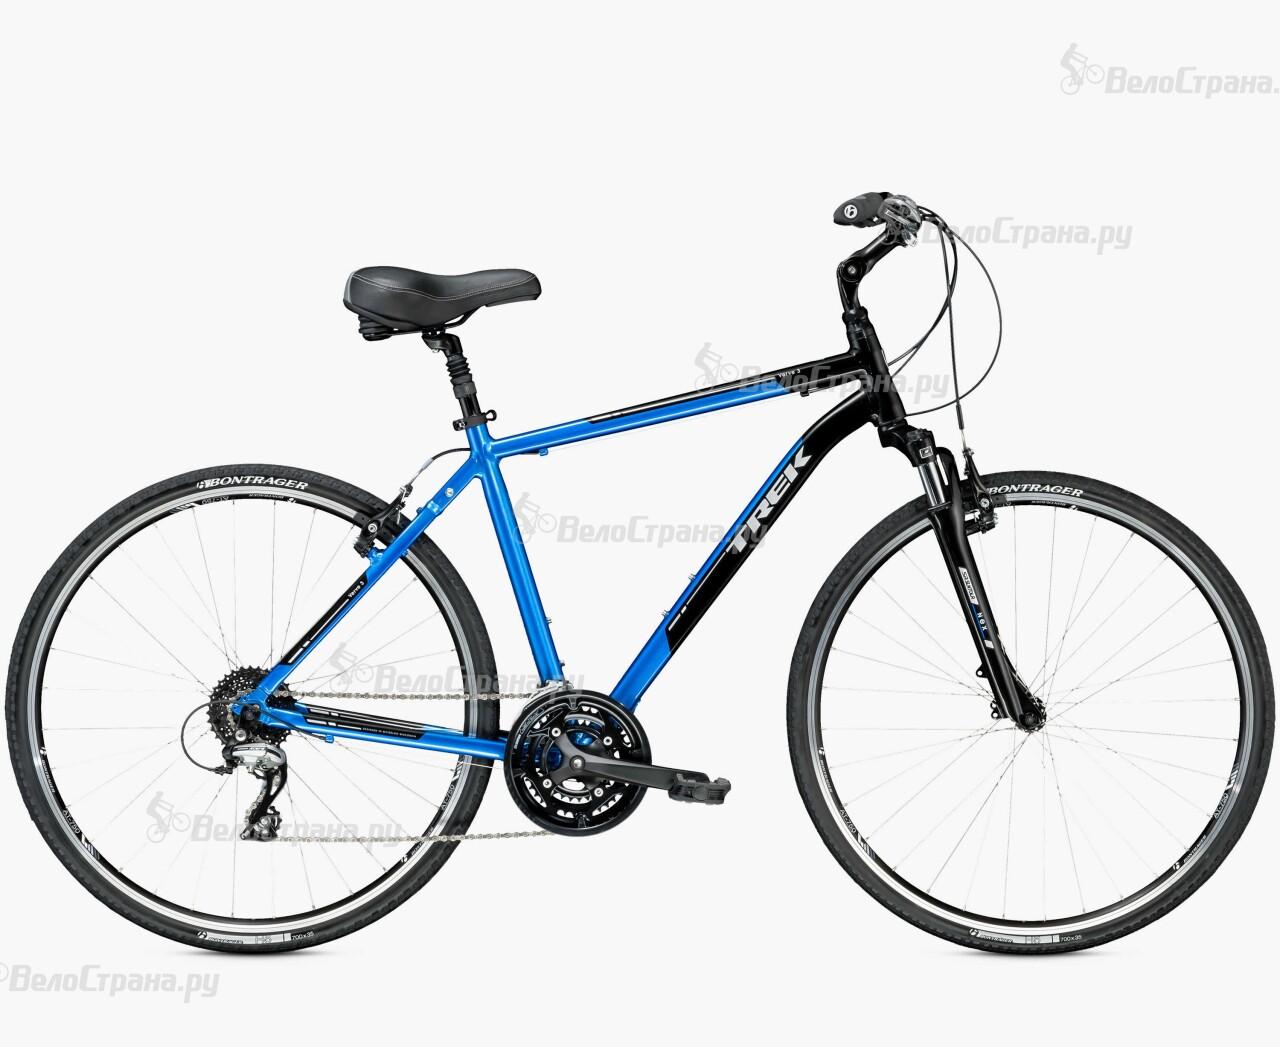 Велосипед Trek Verve 3 (2016) велосипед trek verve 2 2014